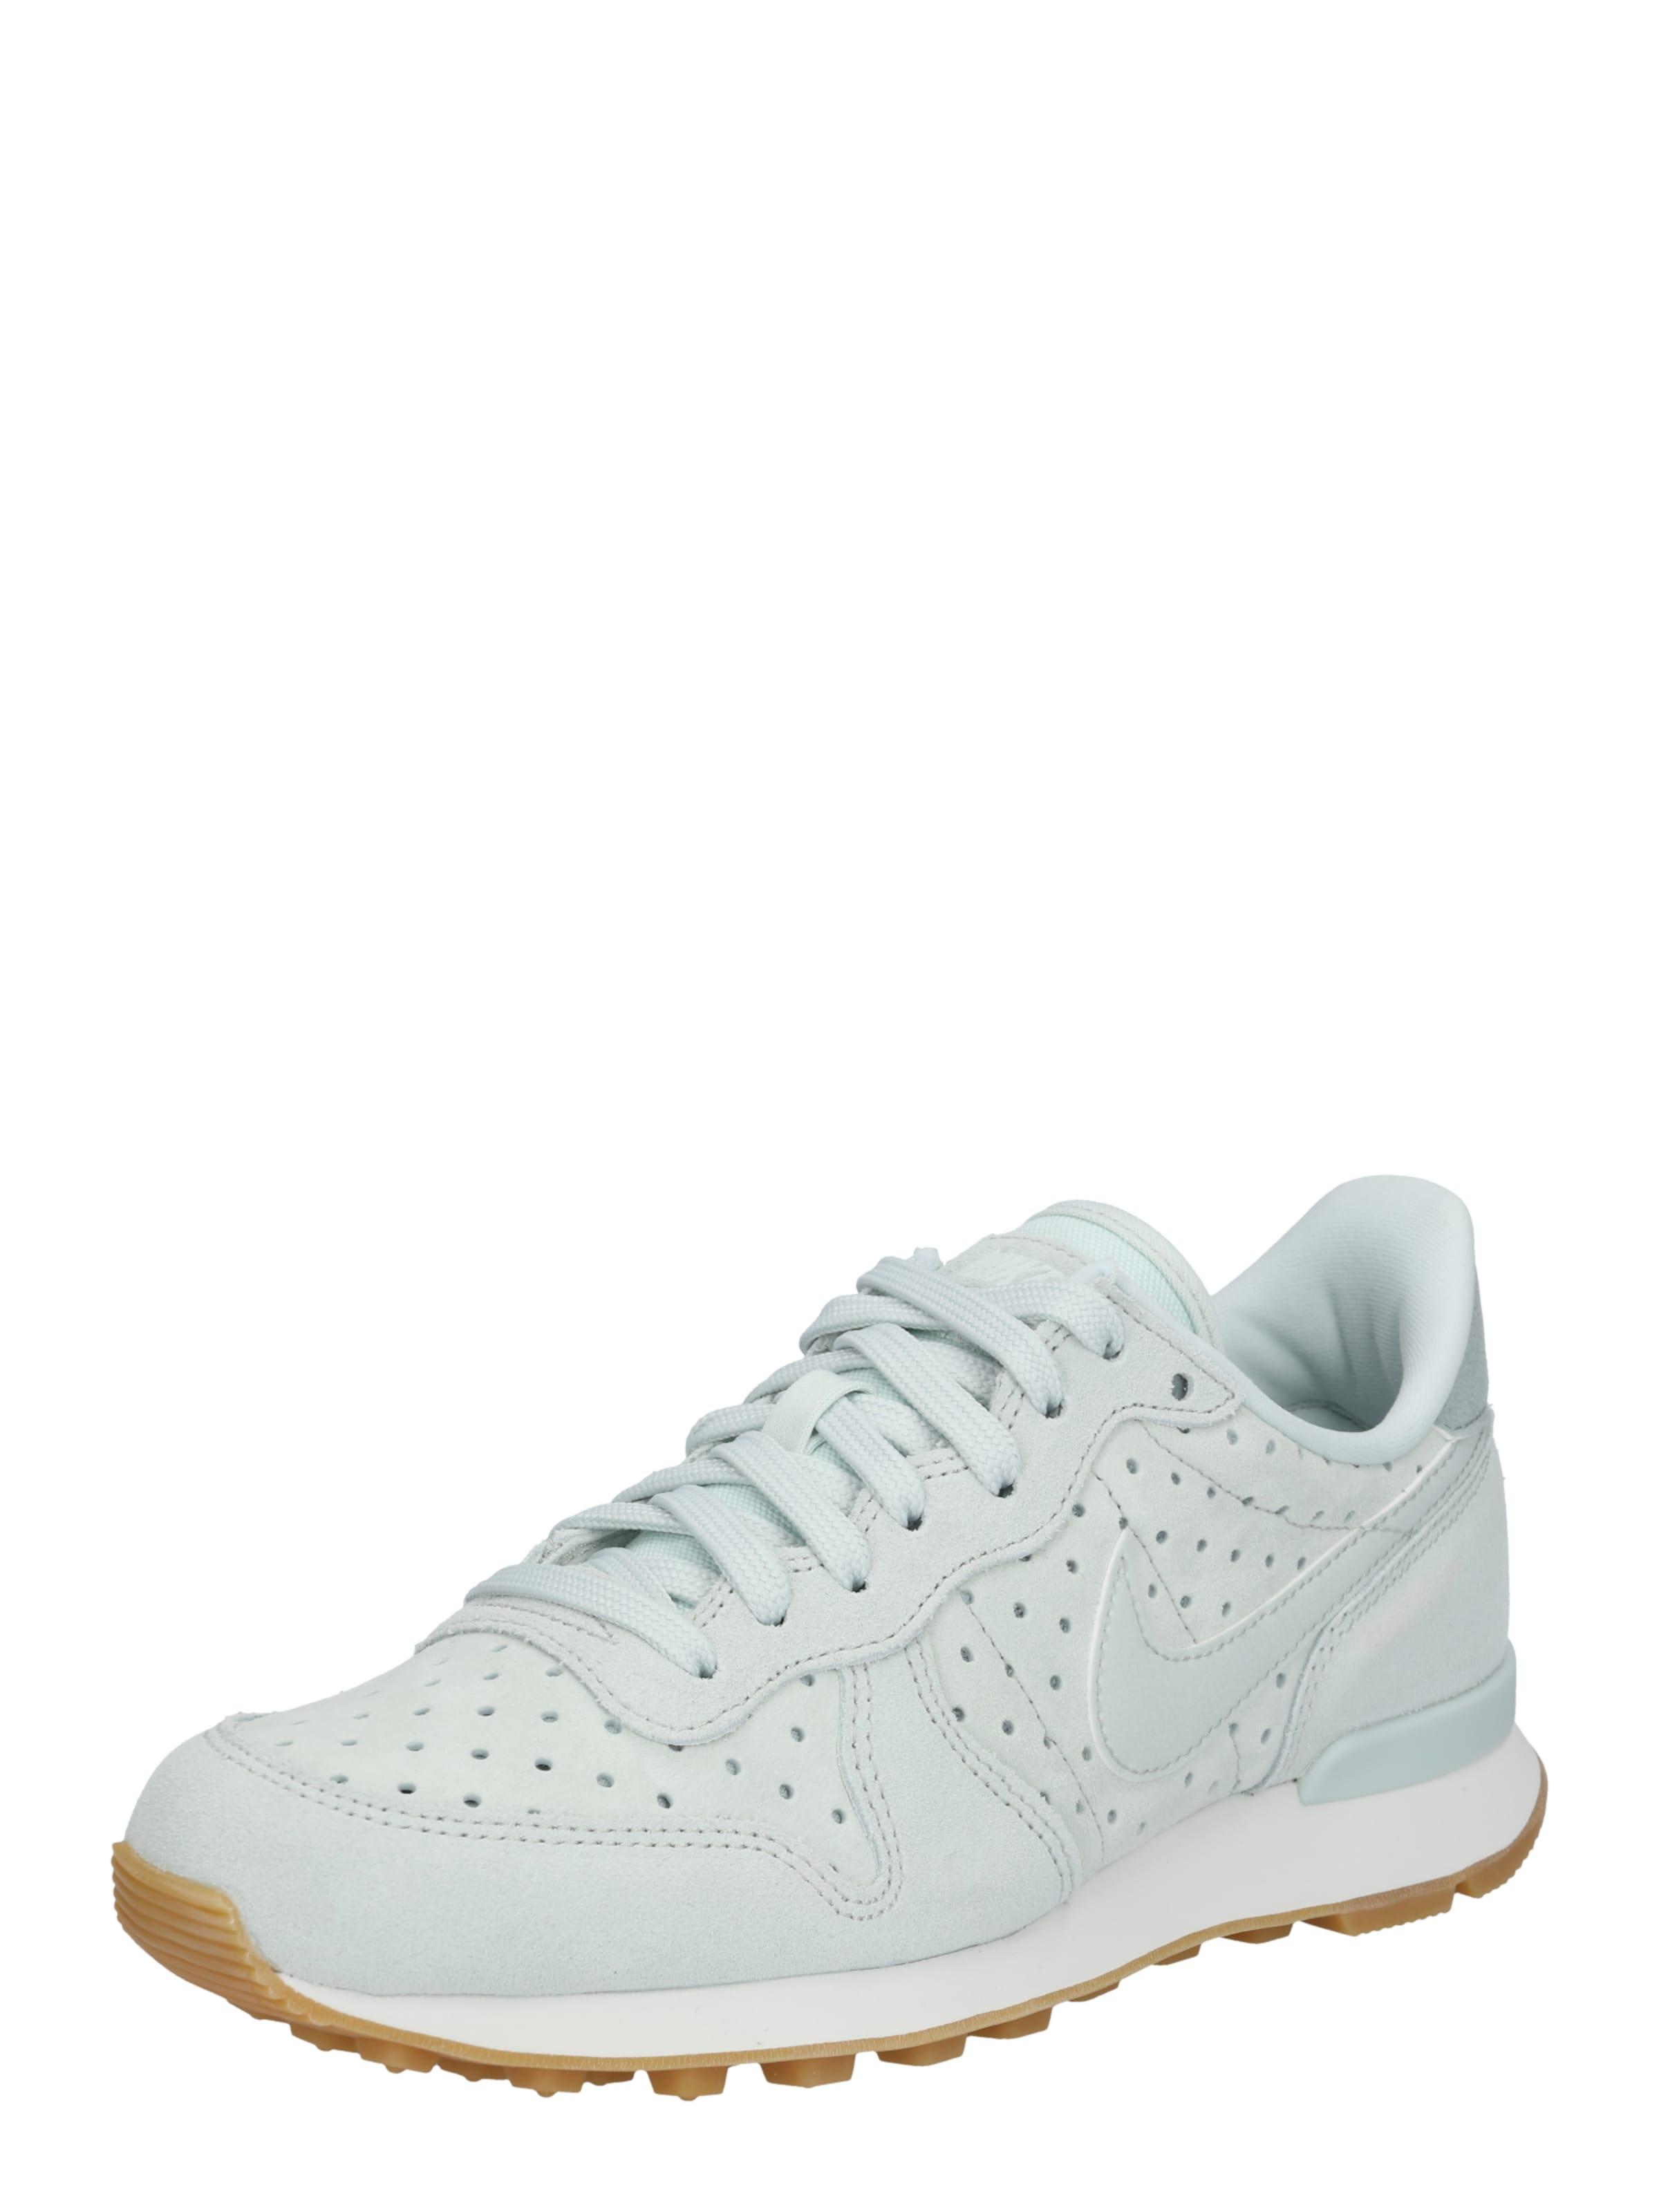 Nike Sportswear   Turnschuhe Internationalist Premium